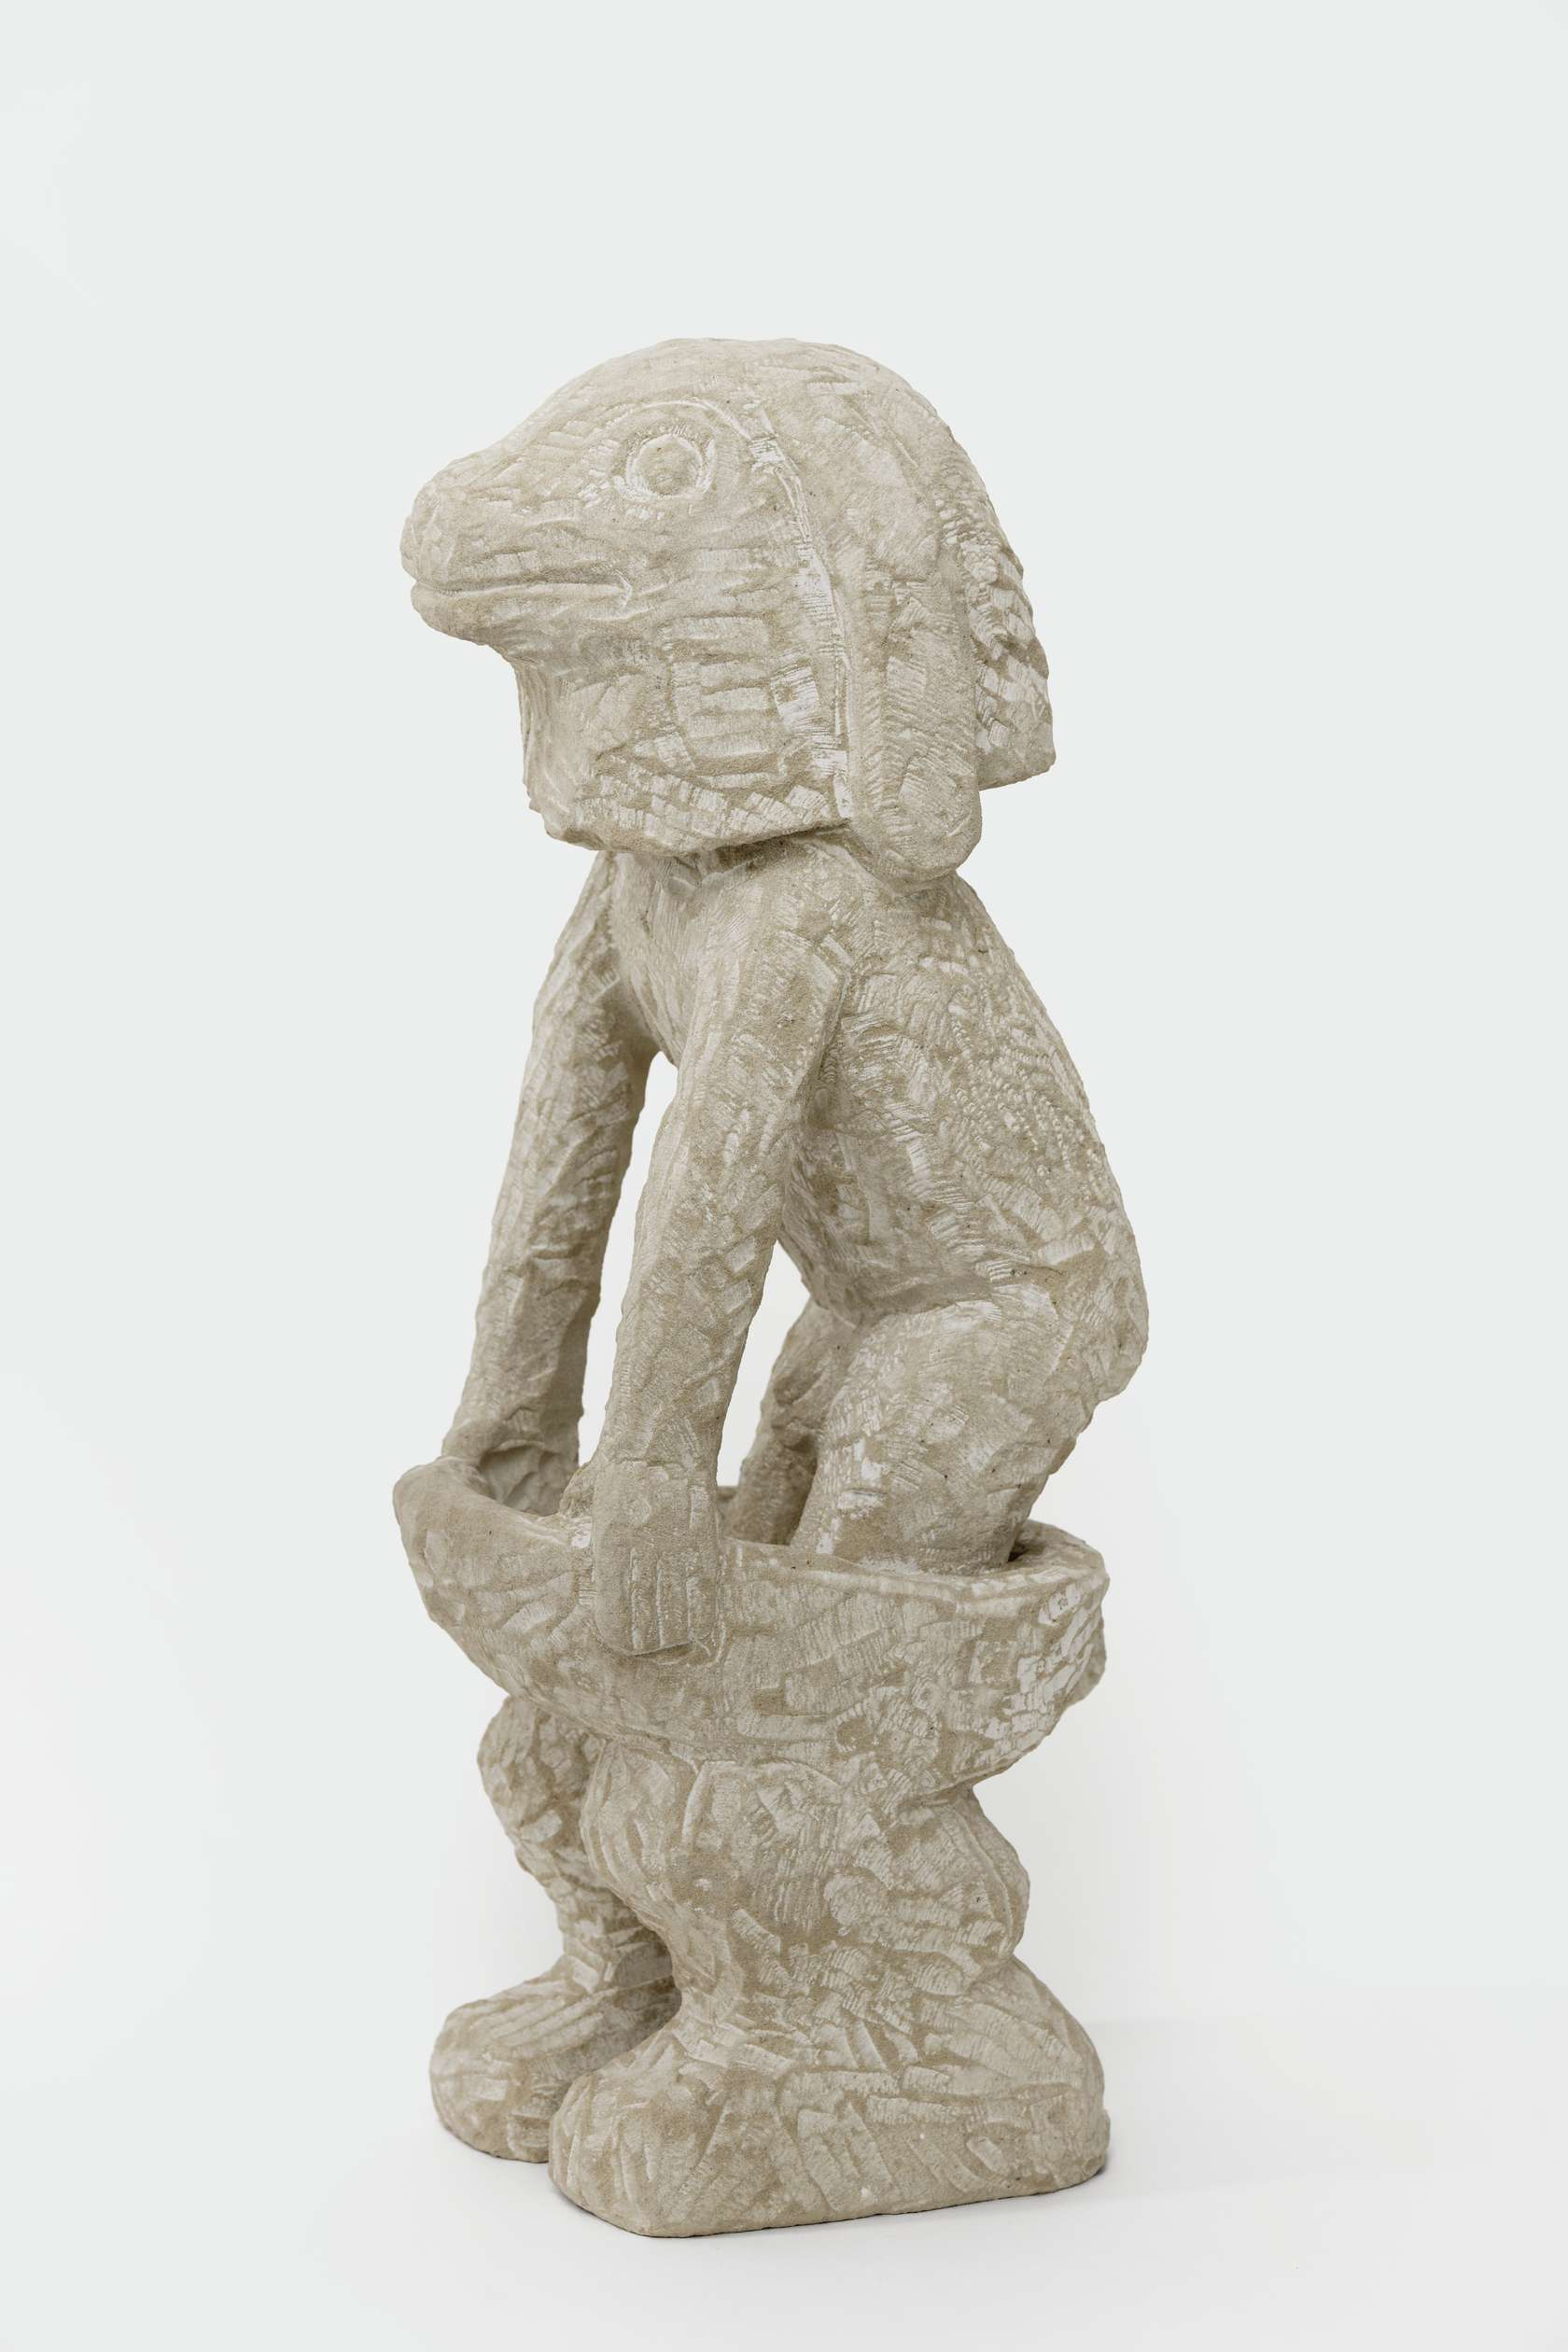 Stefan Rinck, False Rabbit, 2012 Grès50 × 20 × 15 cm / 19 5/8 × 7 7/8 × 5 7/8 in.